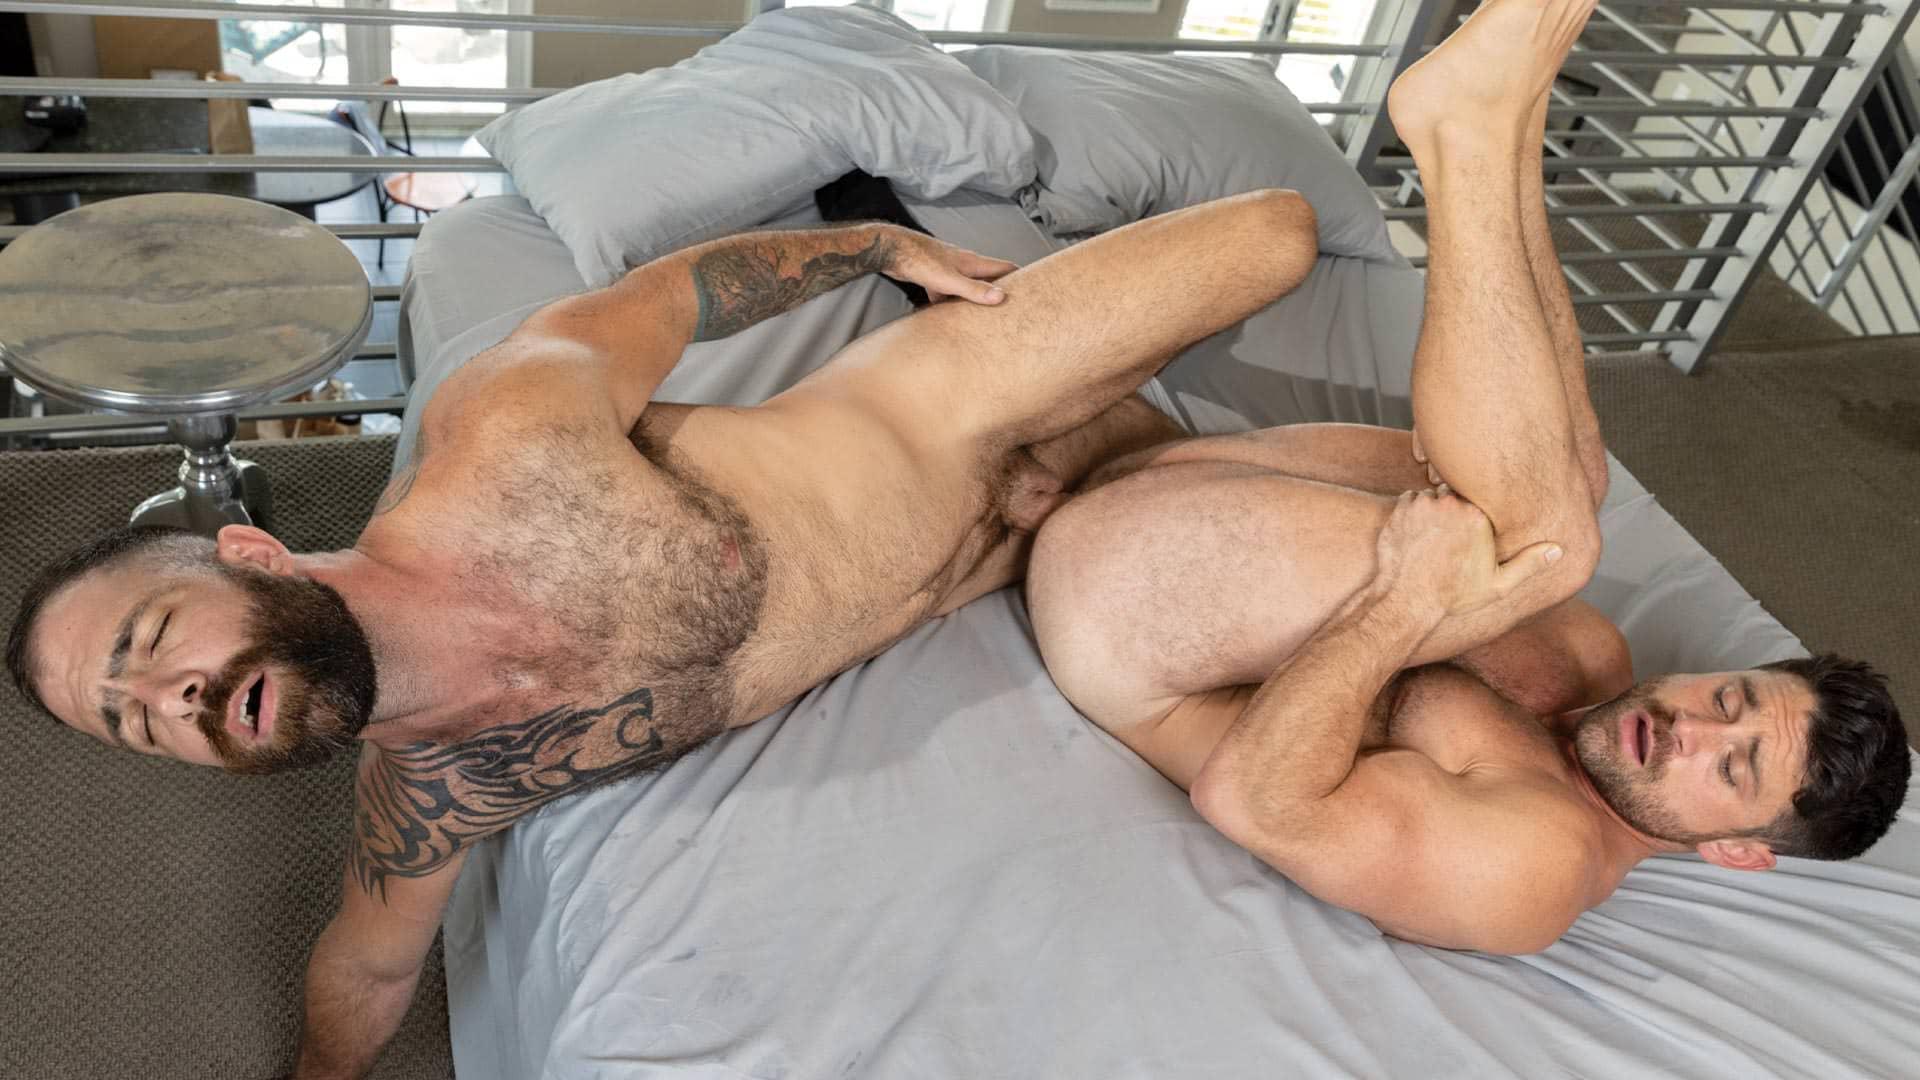 Just Sex, Scene 1 – Jake Nicola and Beau Butler